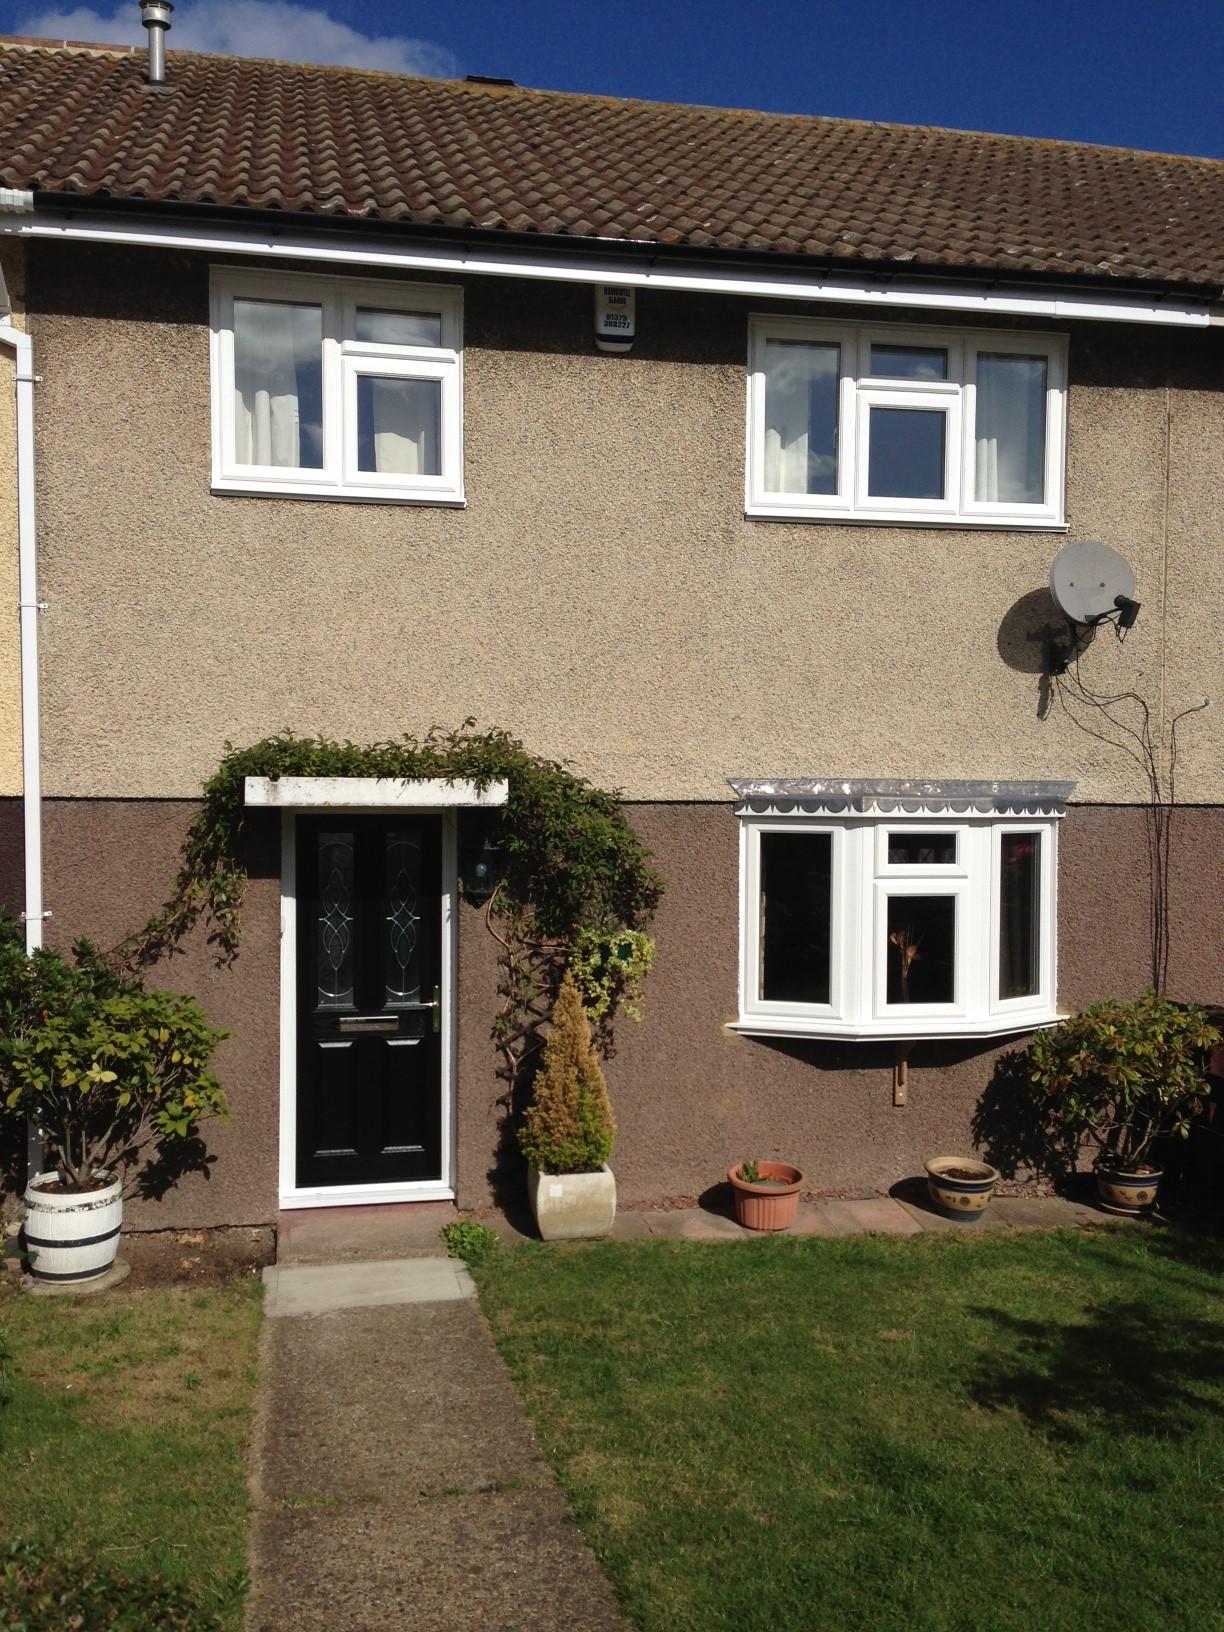 New windows and door on terrace house